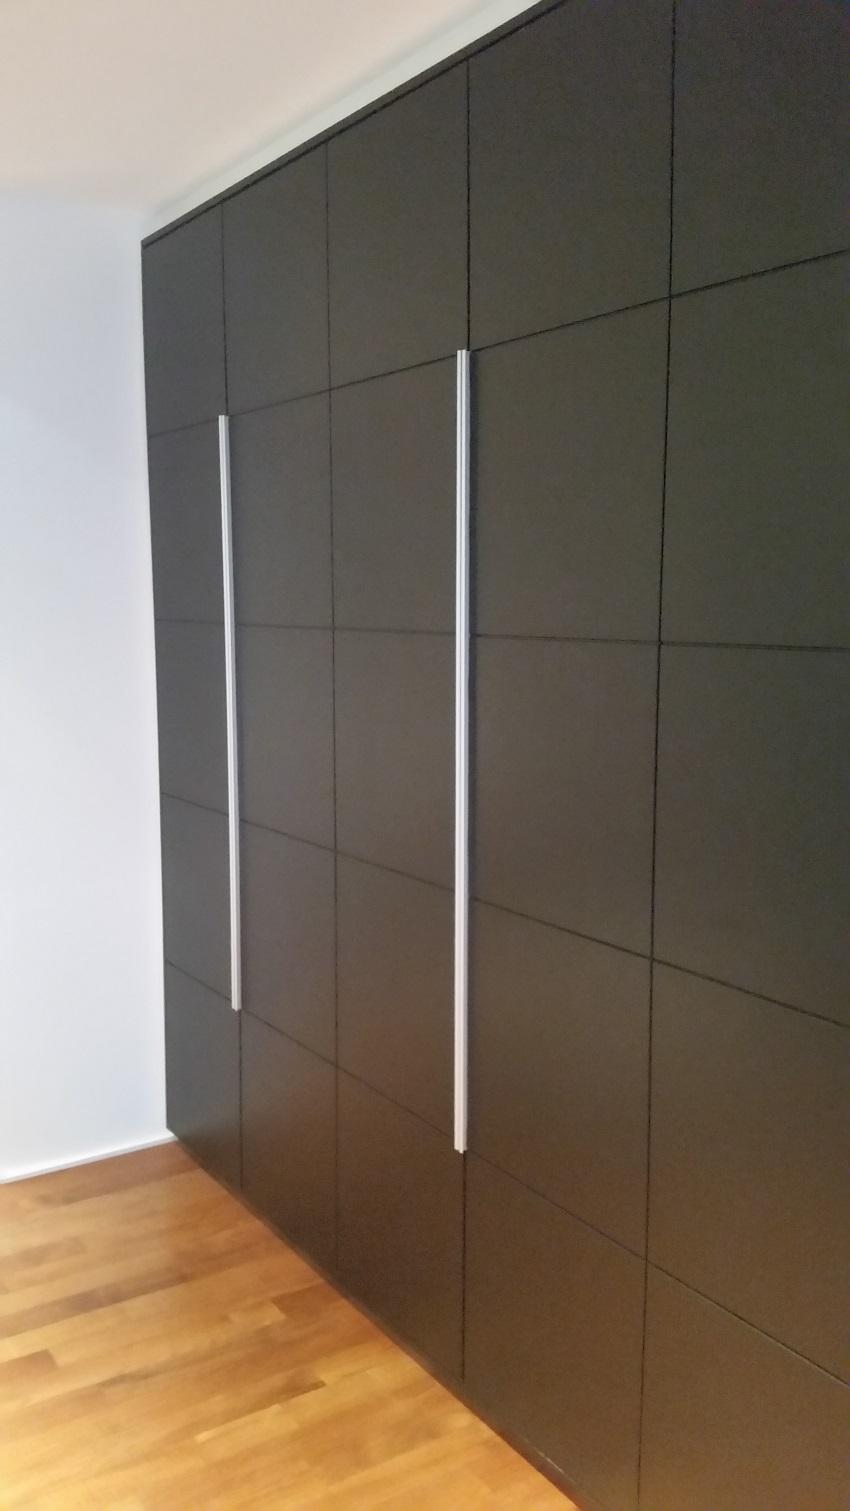 menuiserie lacroix agencement. Black Bedroom Furniture Sets. Home Design Ideas